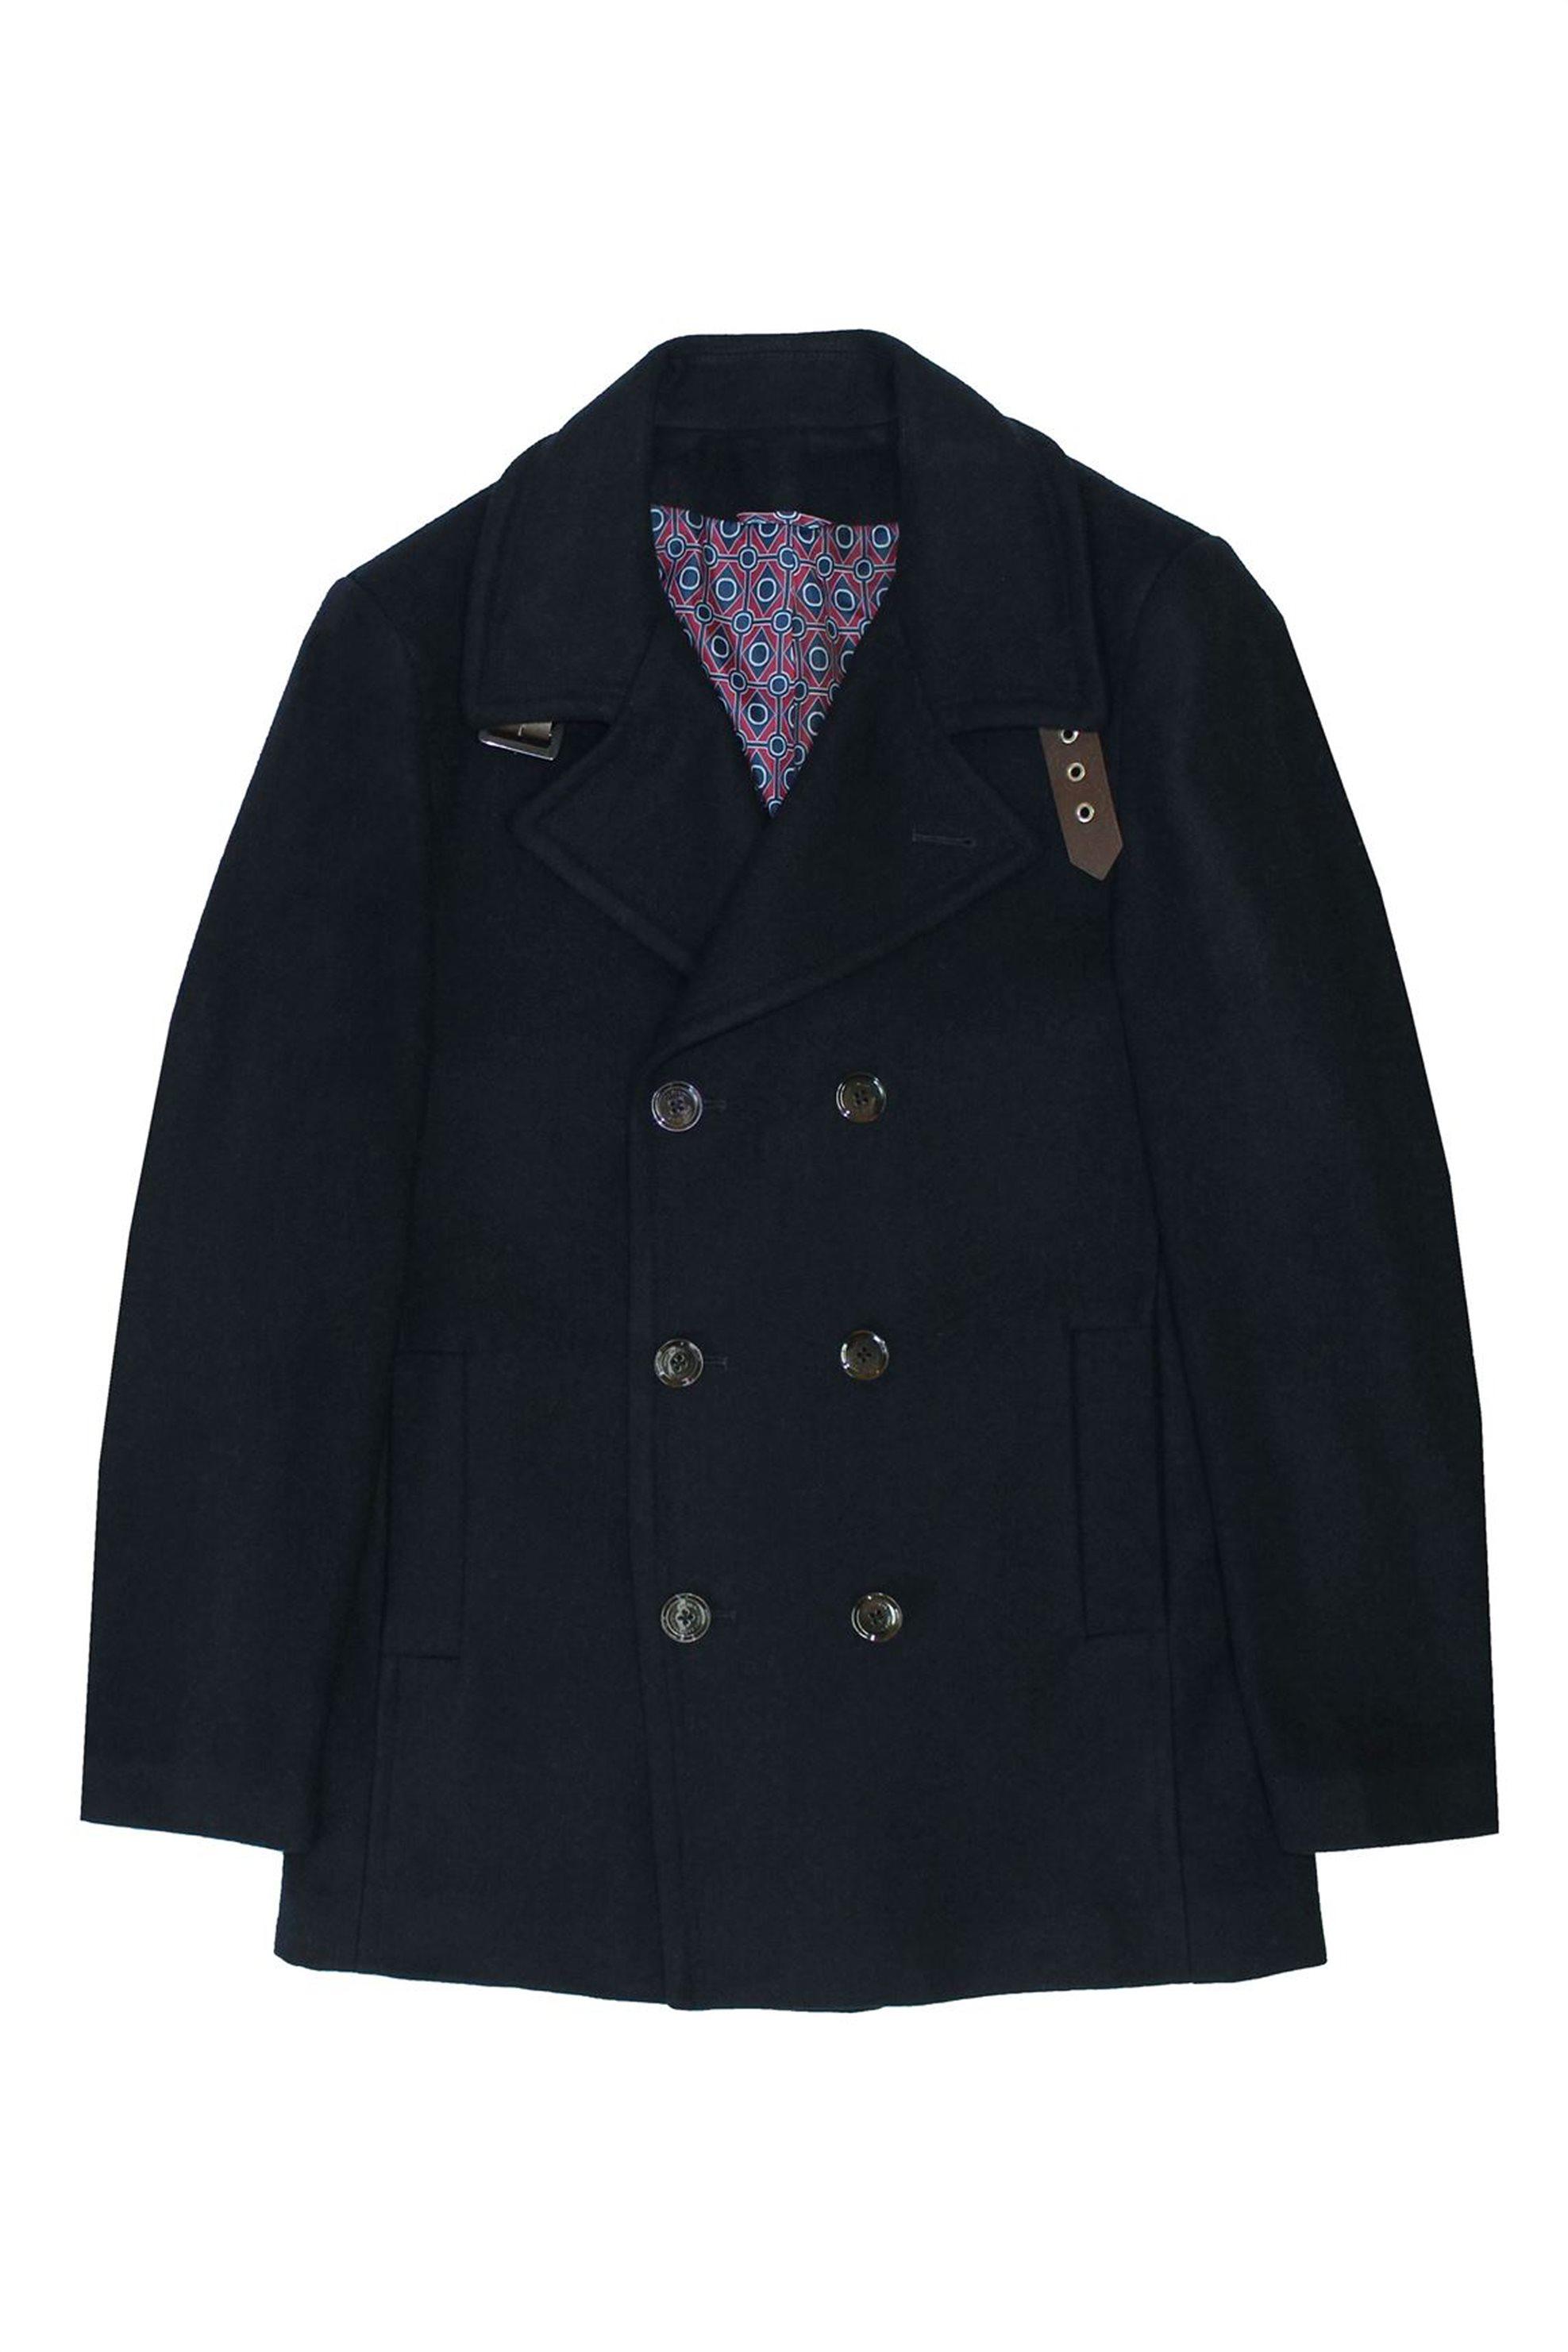 DORS Ανδρικό Παλτό Με Κουμπιά Και Γιακά Με Αγκράφα - 3325002.C1 - Μπλε Σκούρο